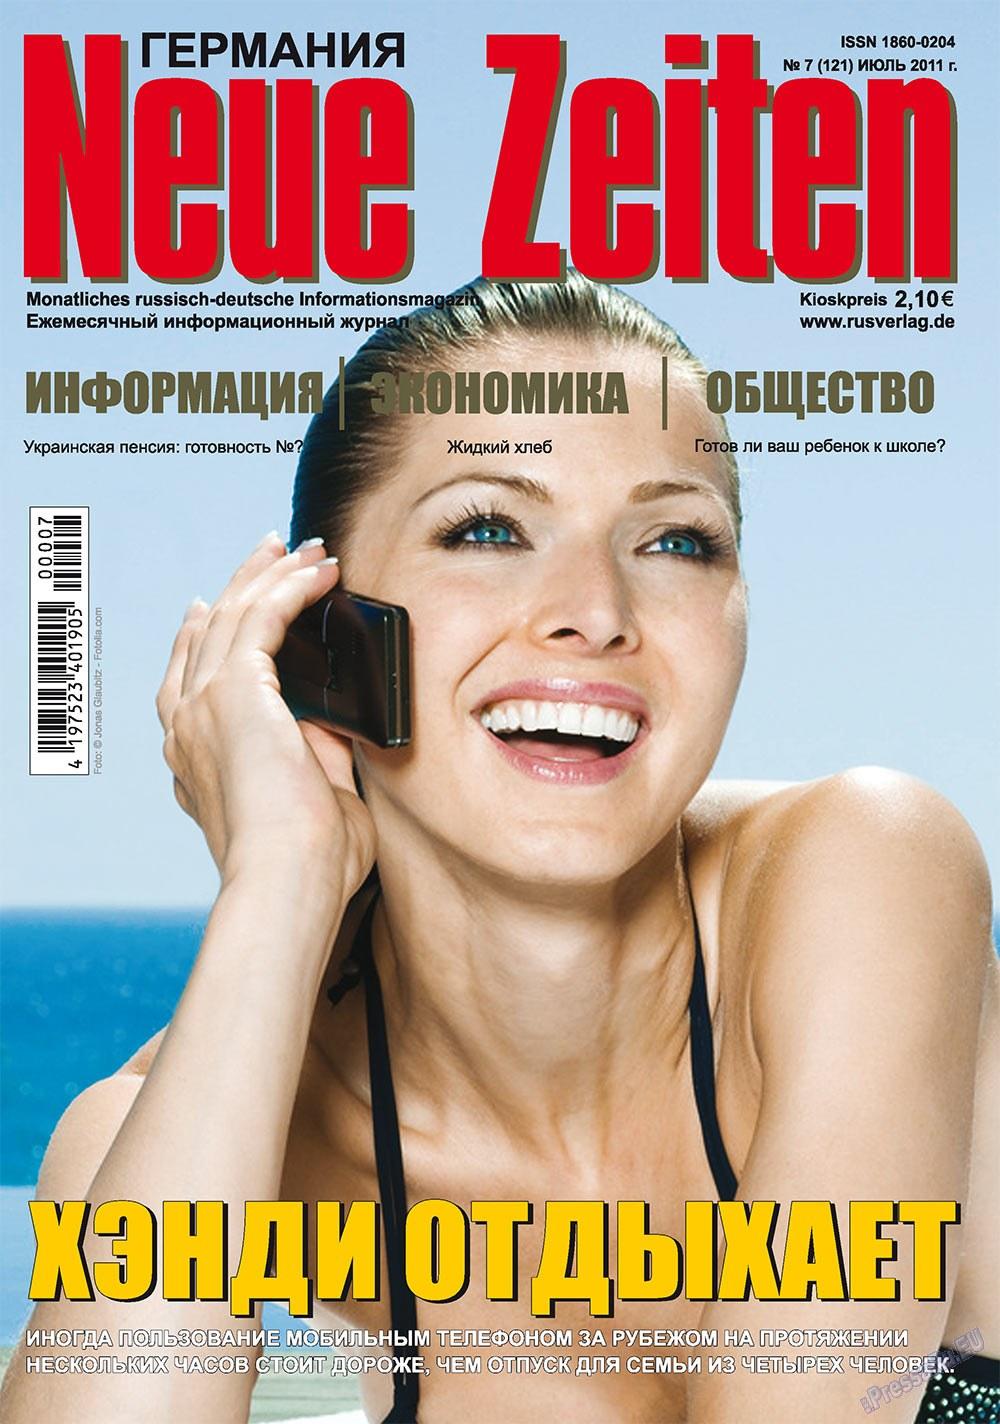 Neue Zeiten (журнал). 2011 год, номер 7, стр. 1